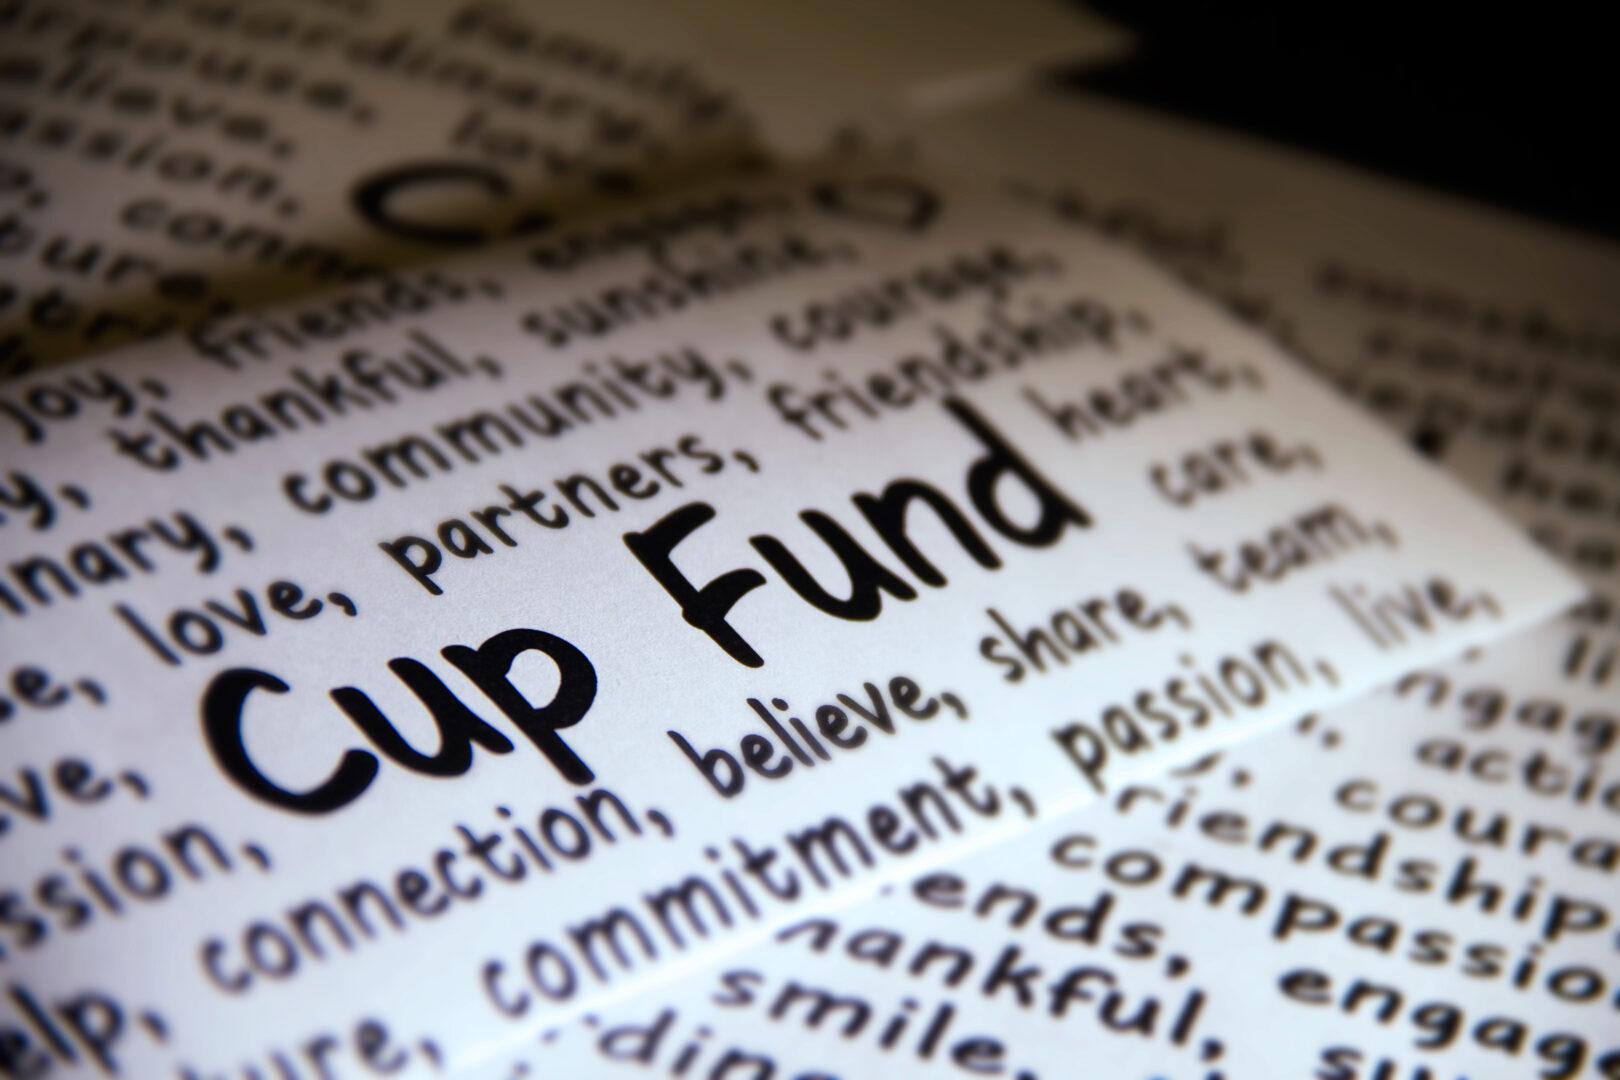 Starbucks CUP Fund